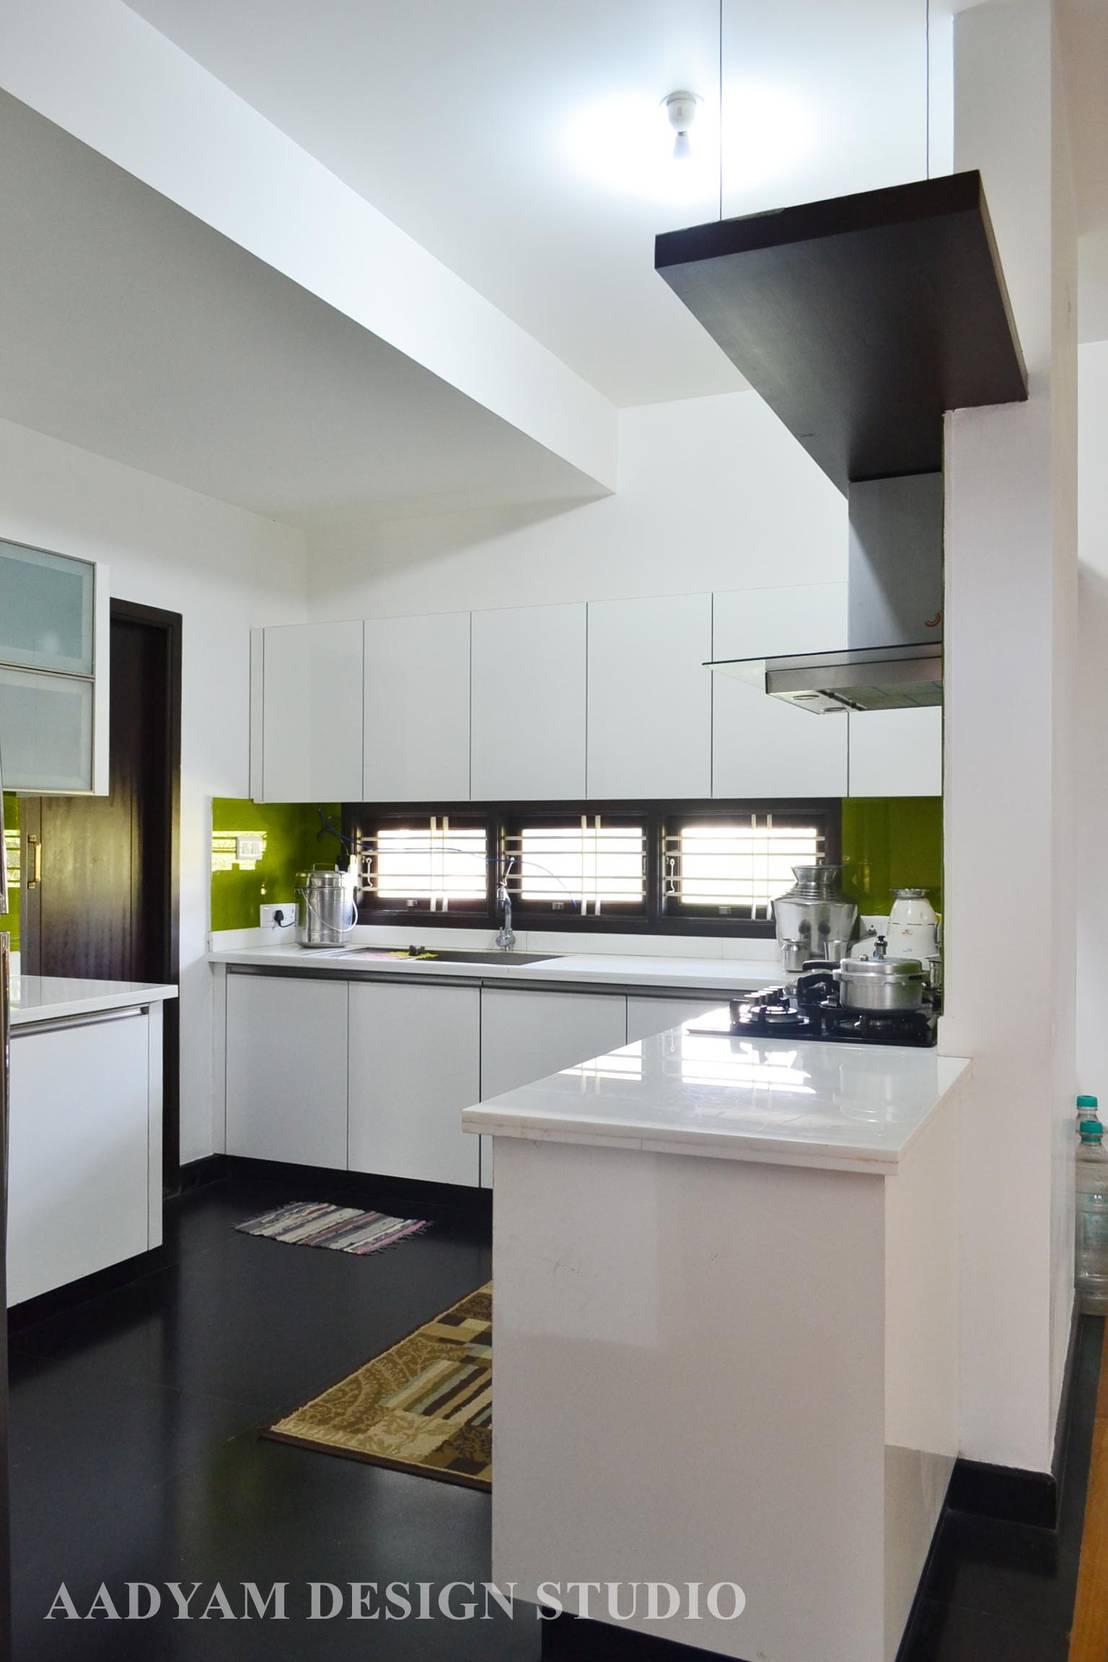 Aadyam Design Studio: Architects in Bangalore | homify